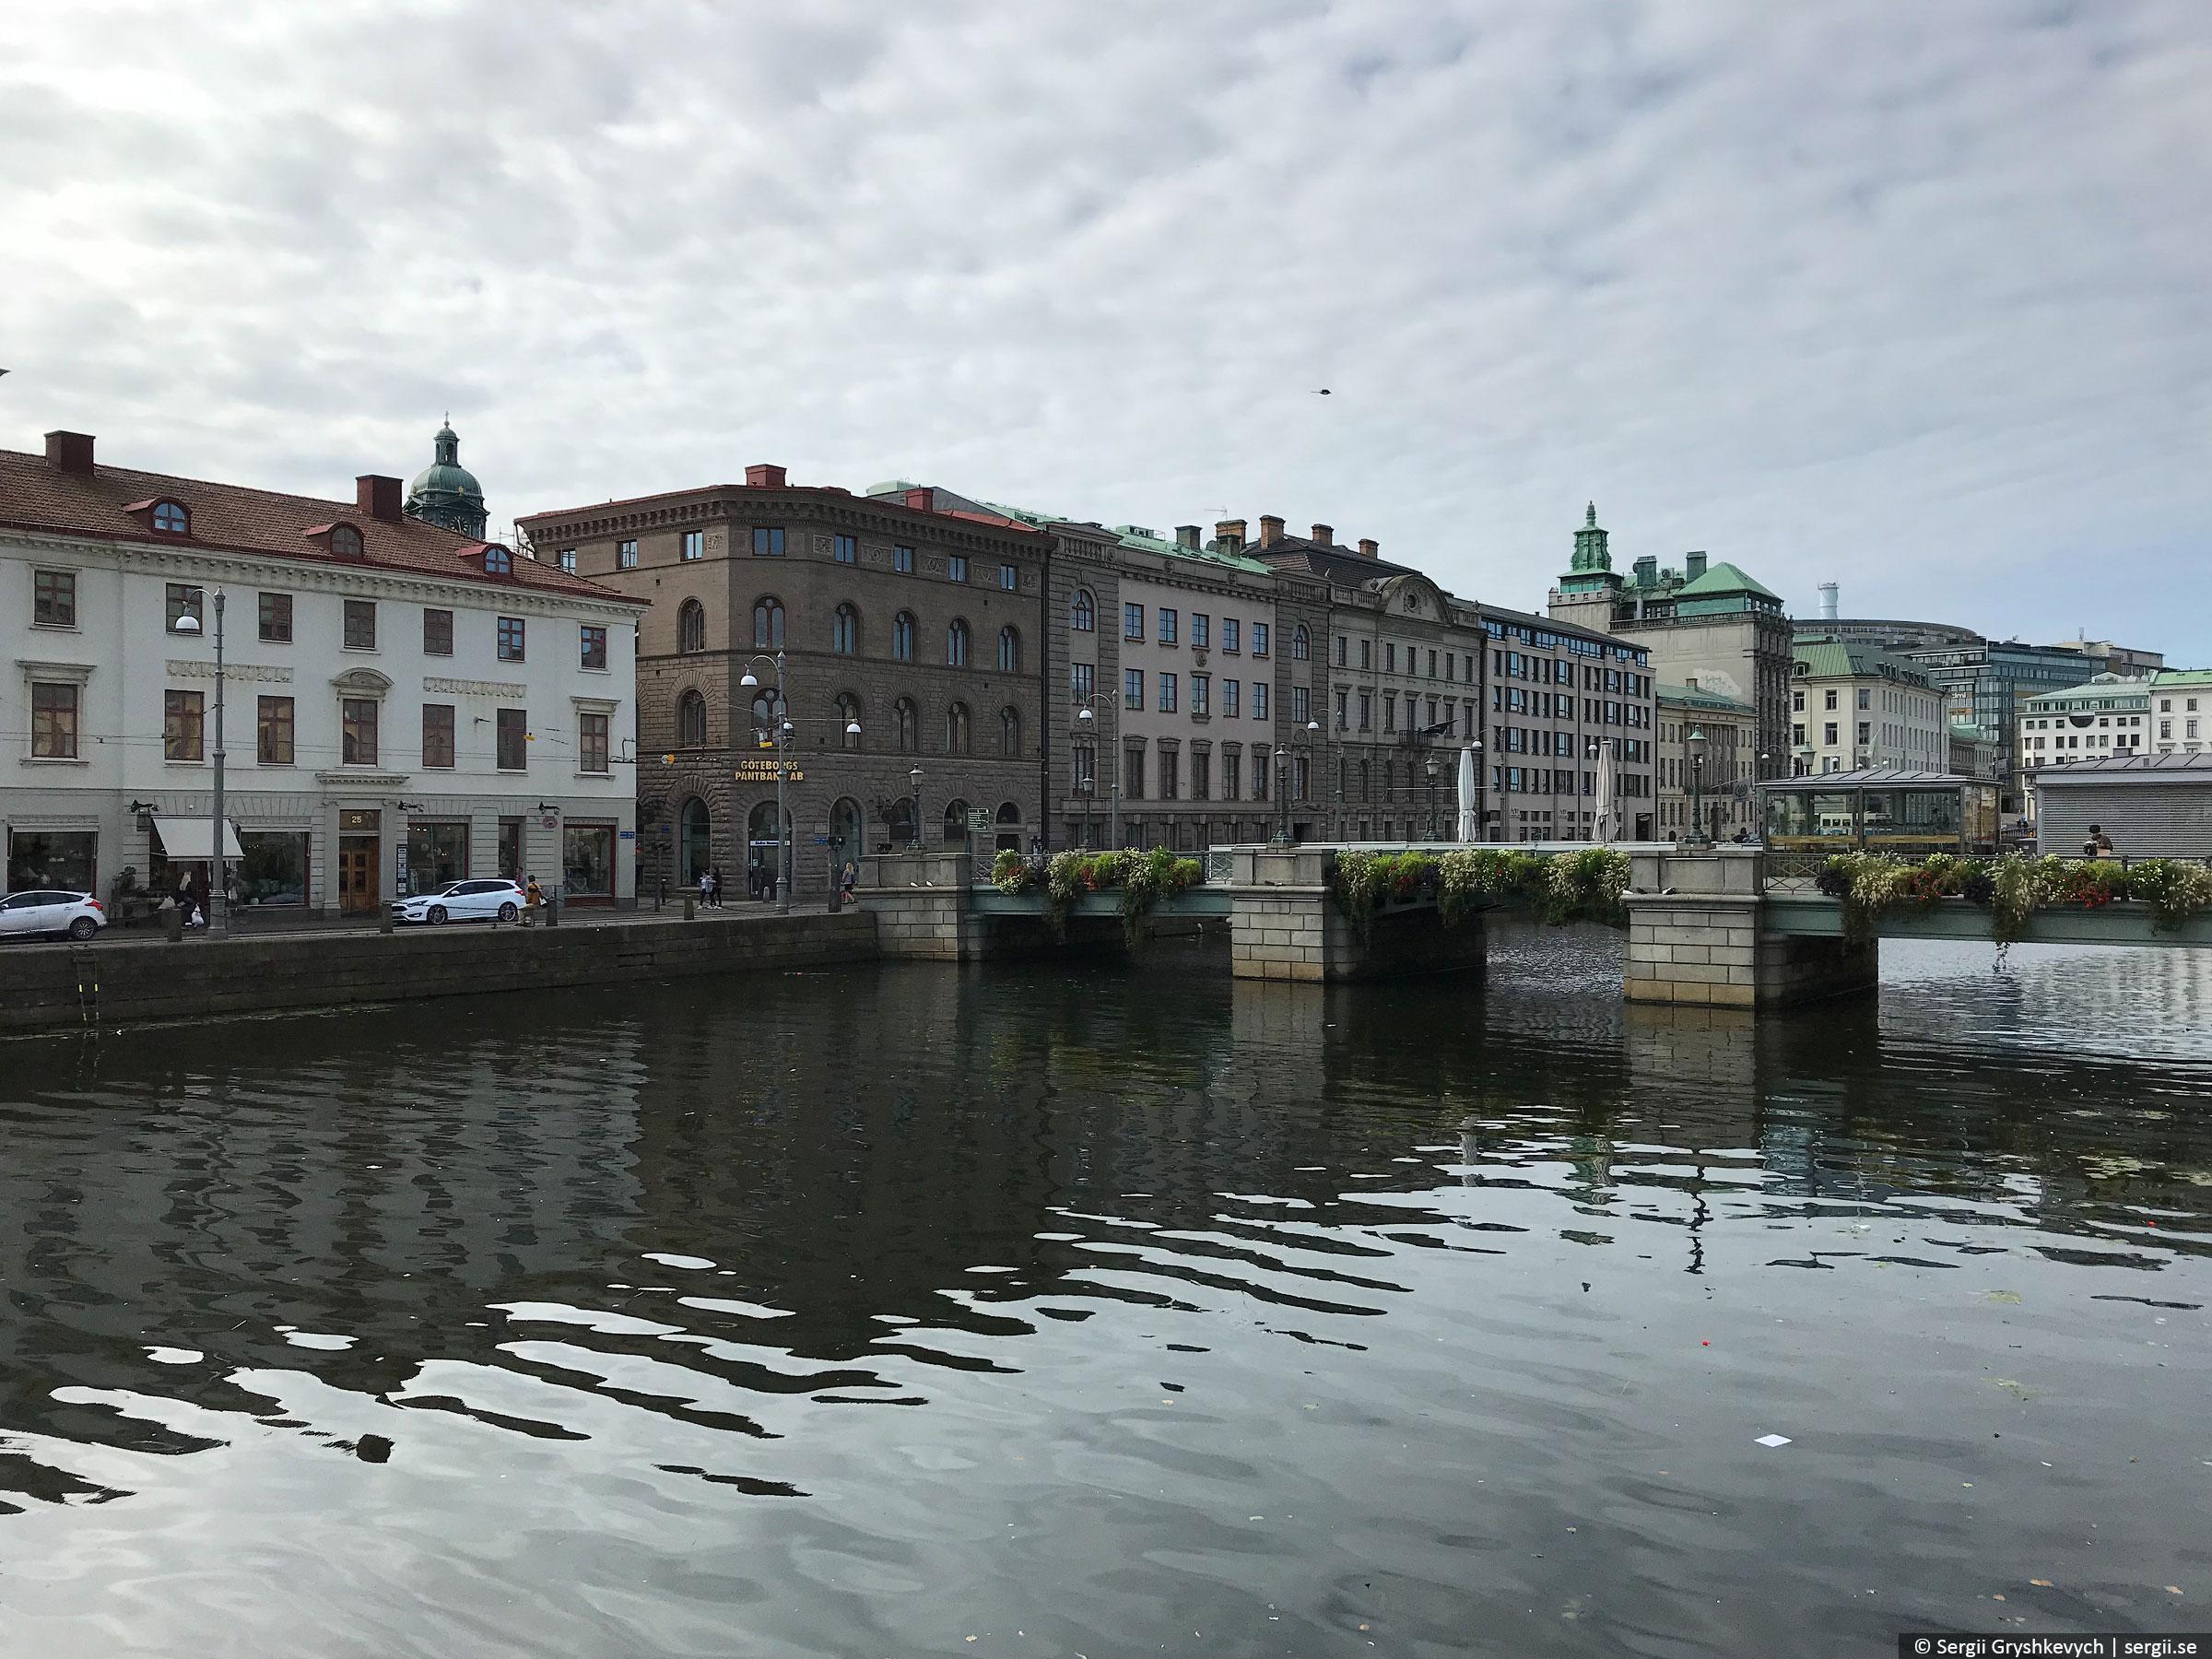 göteborg-ghotenburg-sweden-2018-23